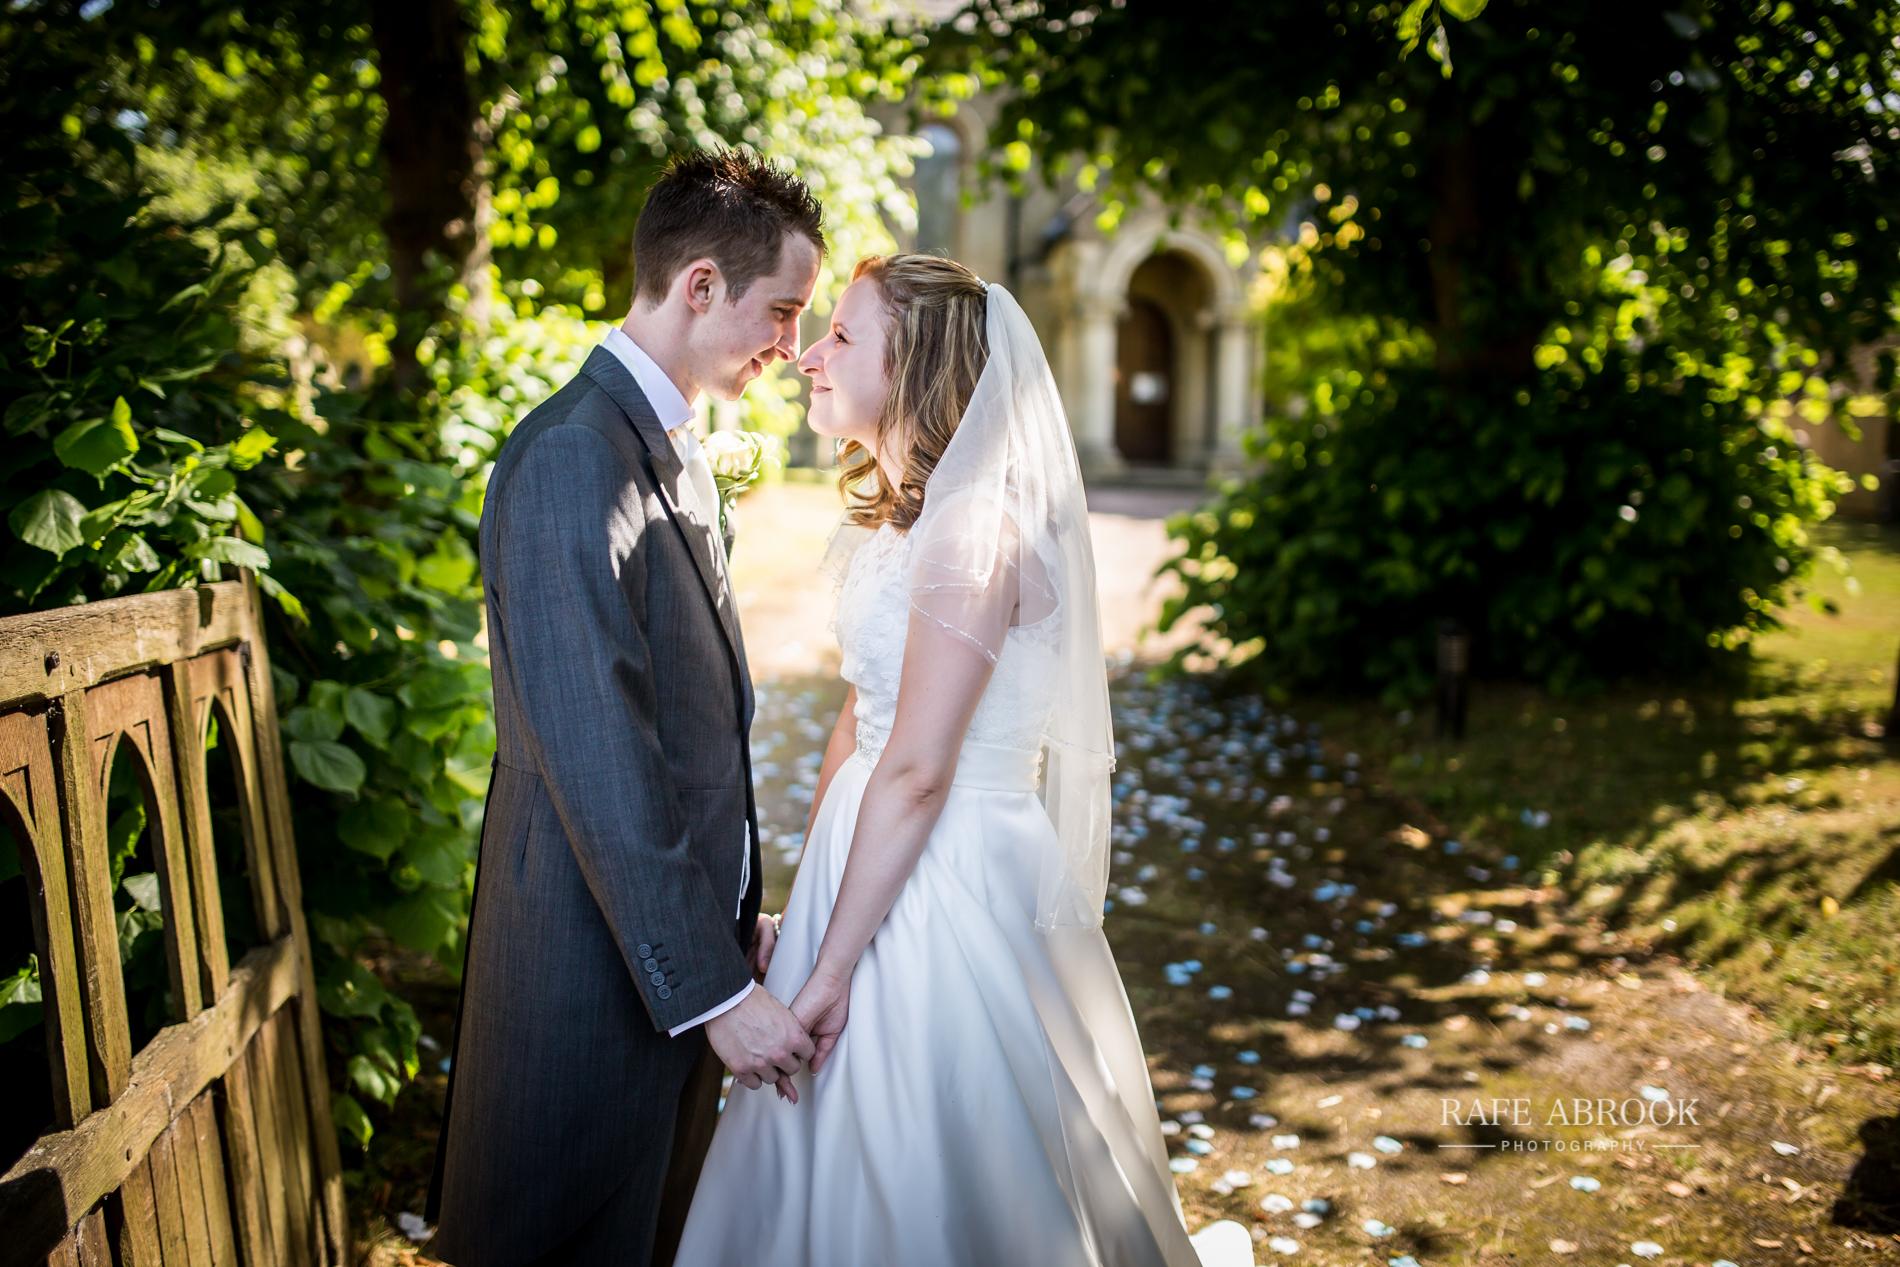 wedding photographer hertfordshire noke thistle hotel st albans -1264.jpg